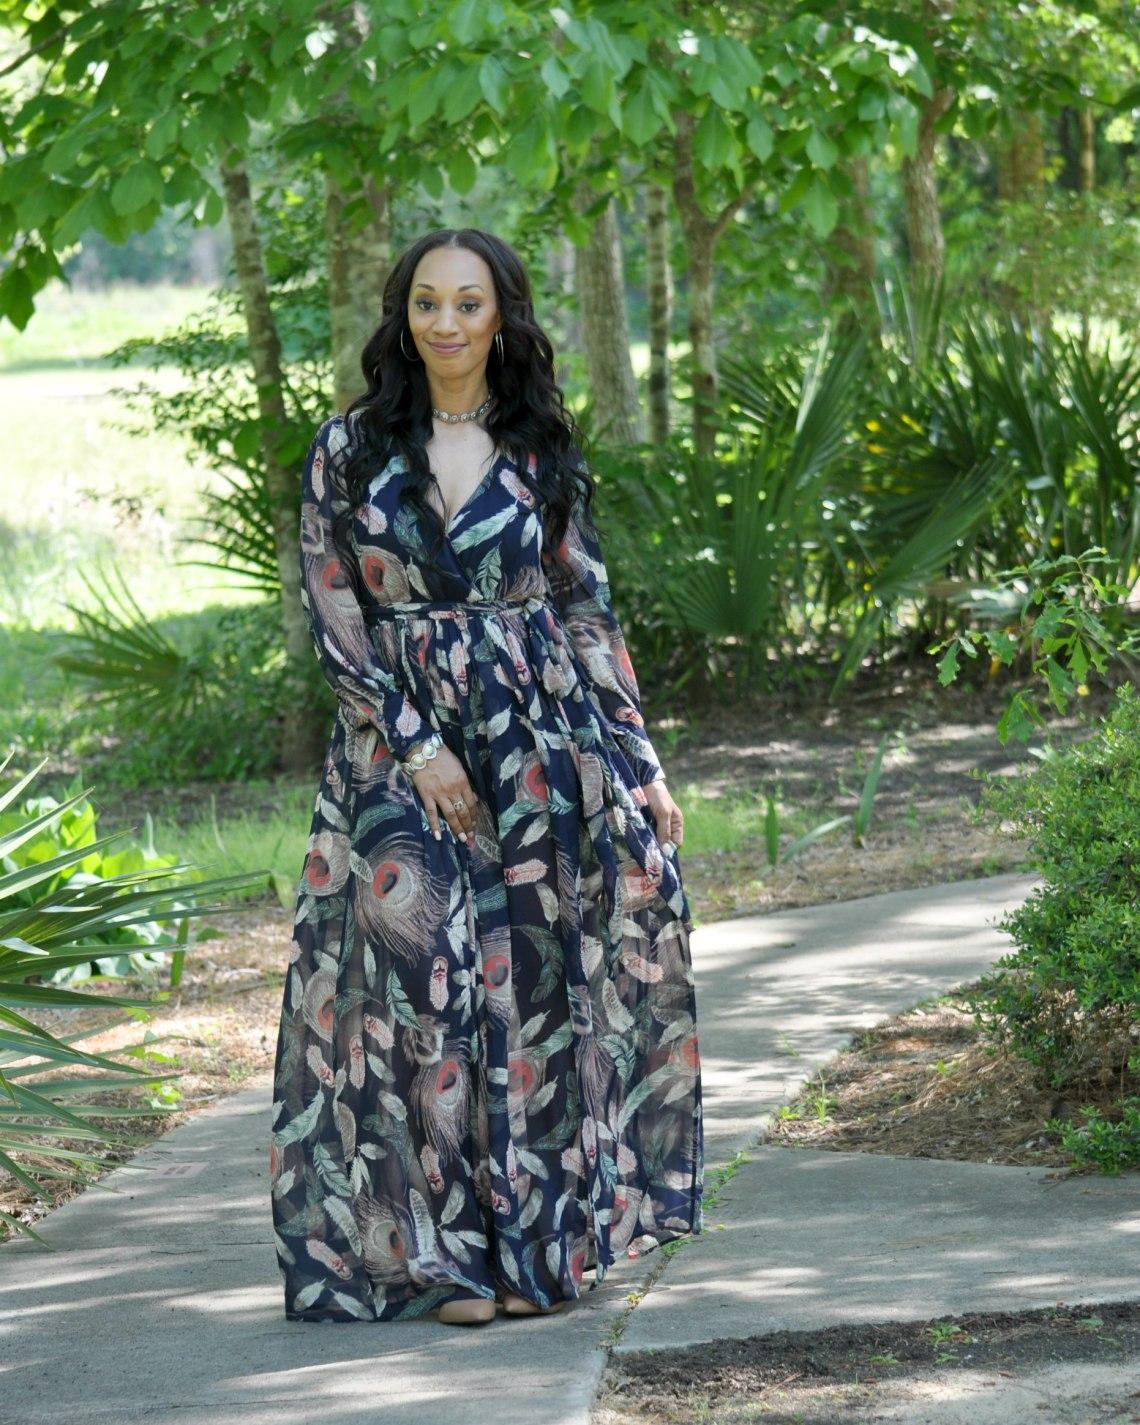 340c4de6cde13c Brunch Date Navy Maxi Dress - The Life She Created Blog